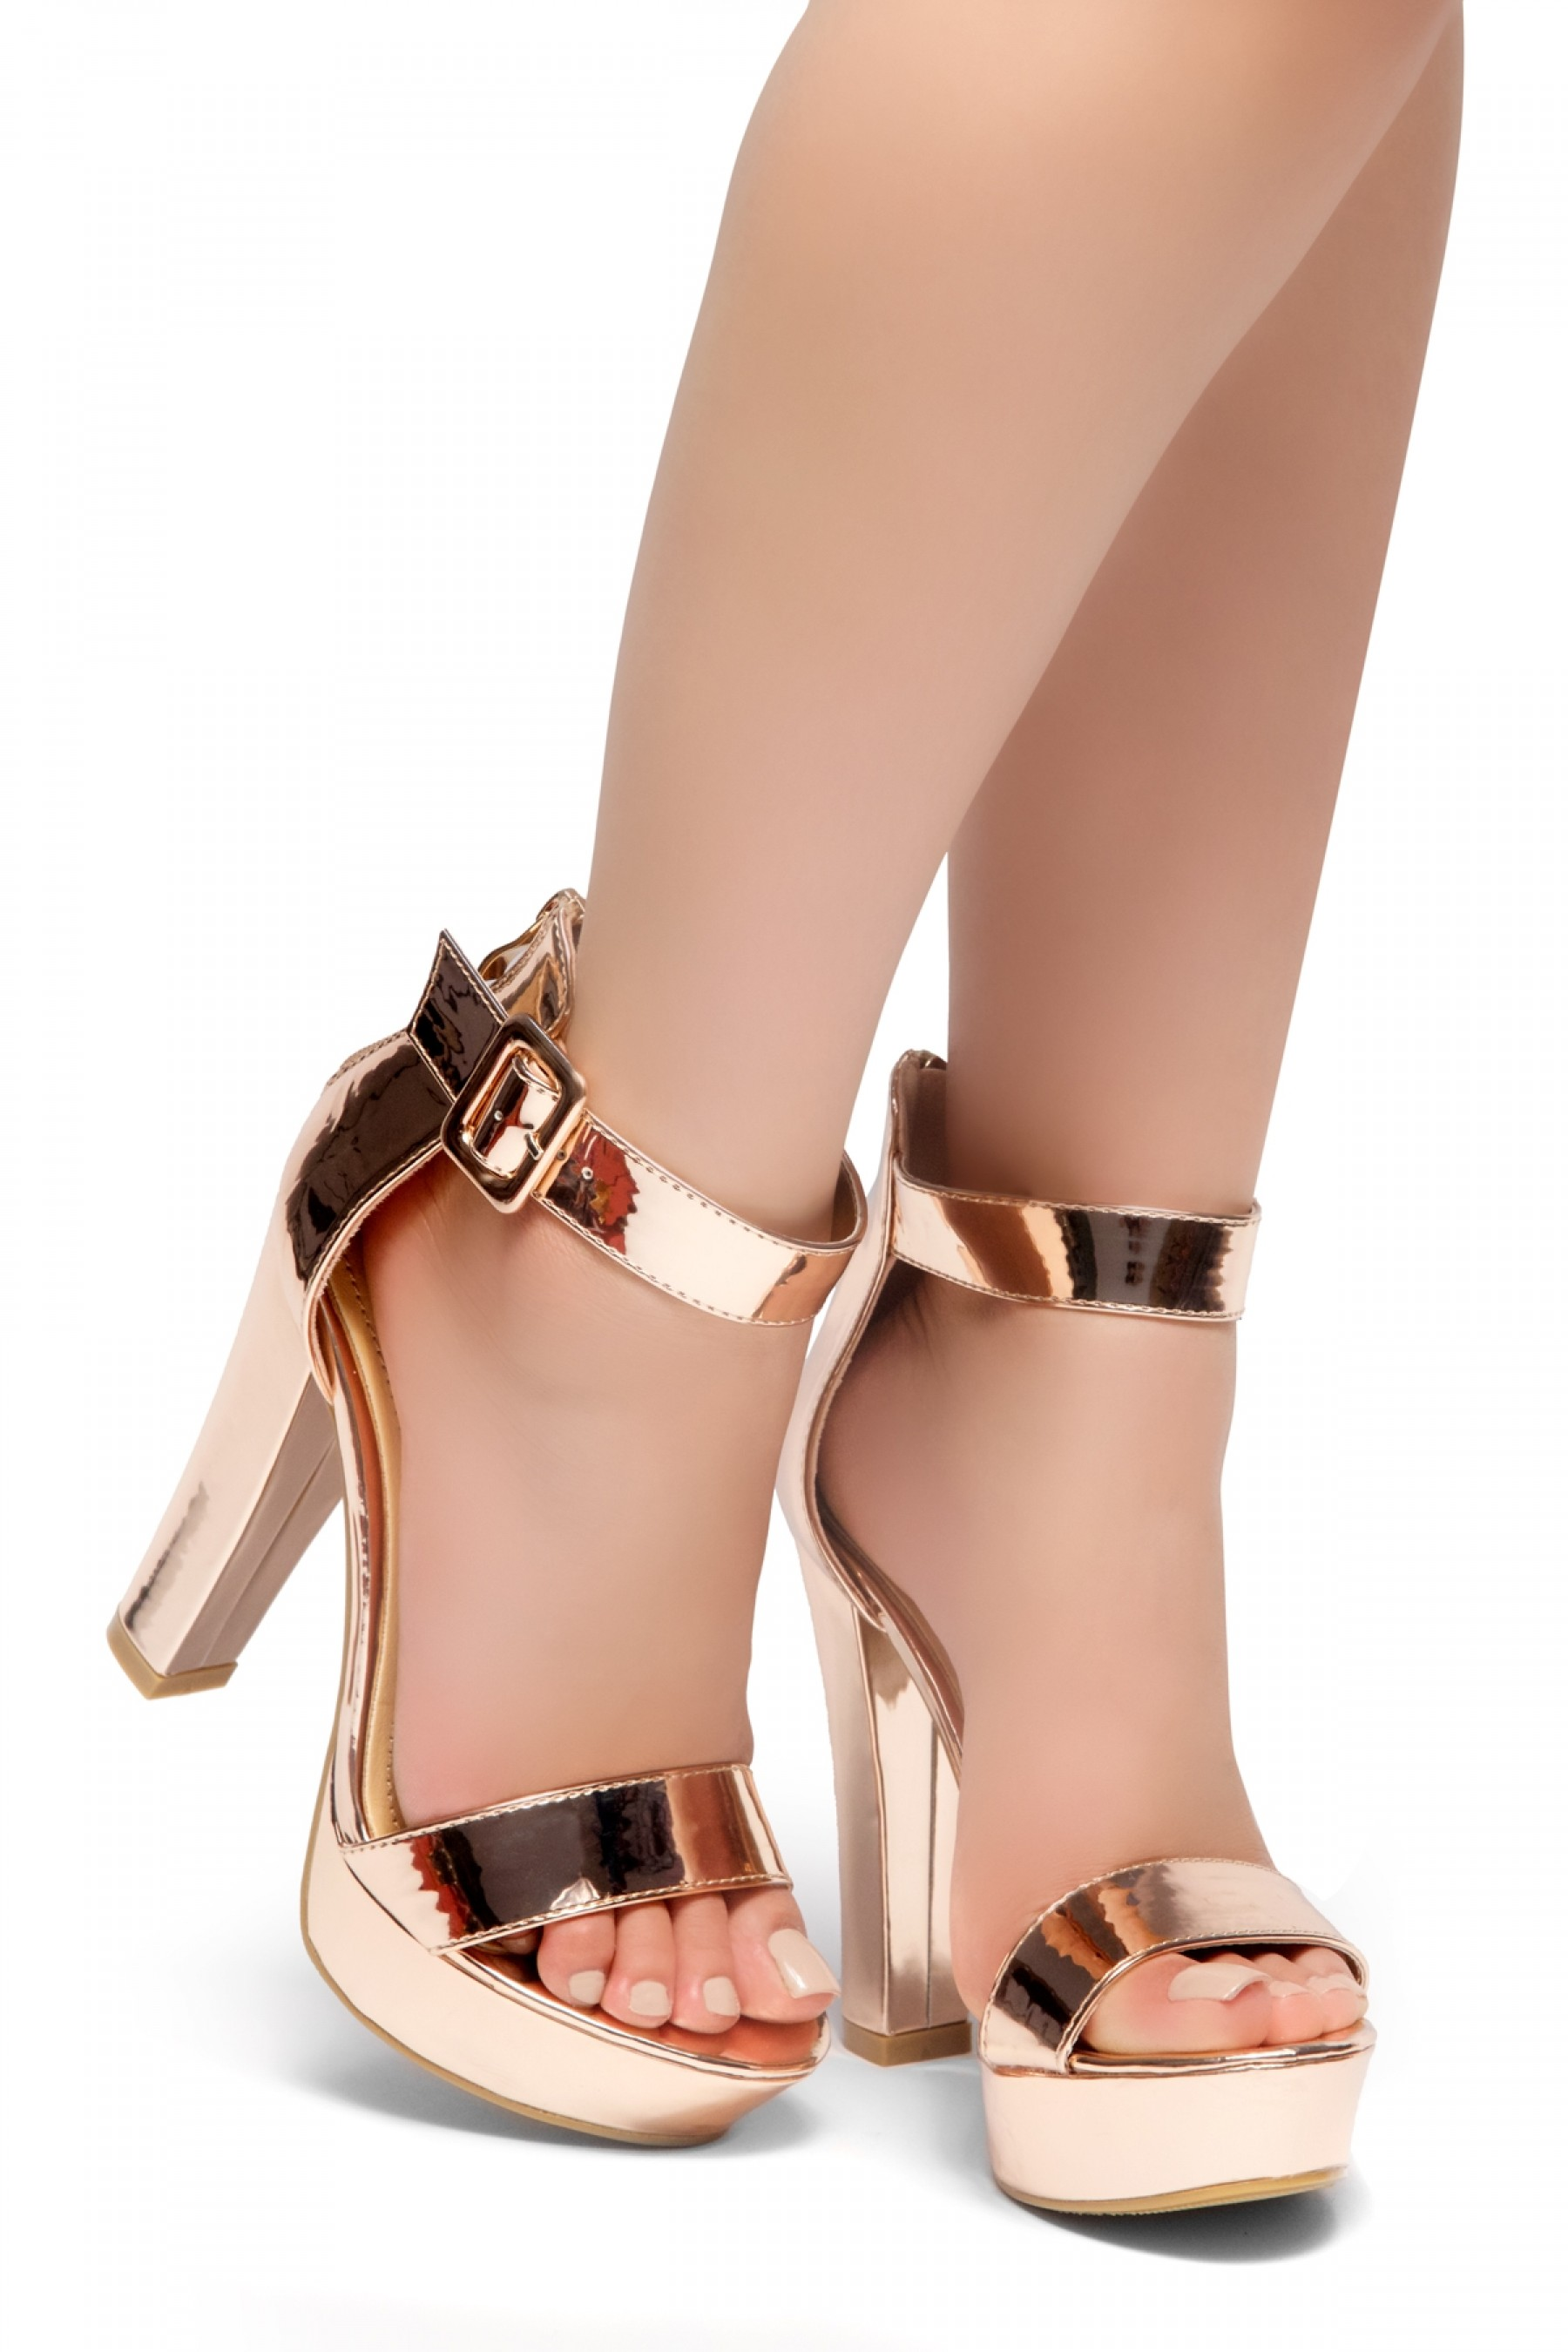 ba491ccdac1e5 HerStyle LOVE LIKE WHOA-Open Toe Ankle Strap Chunky Platform ...